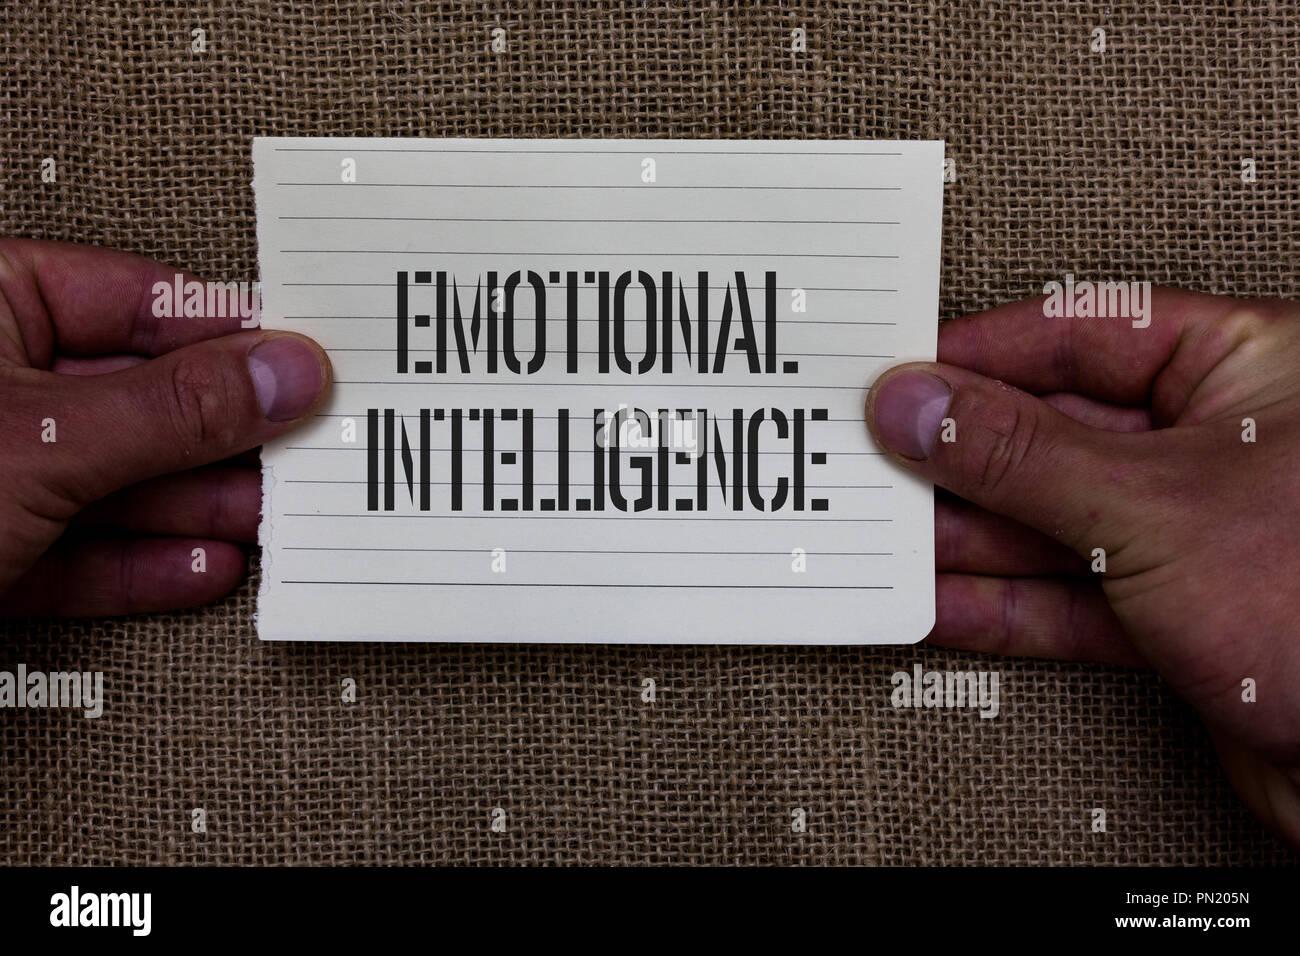 emotional intelligence paper